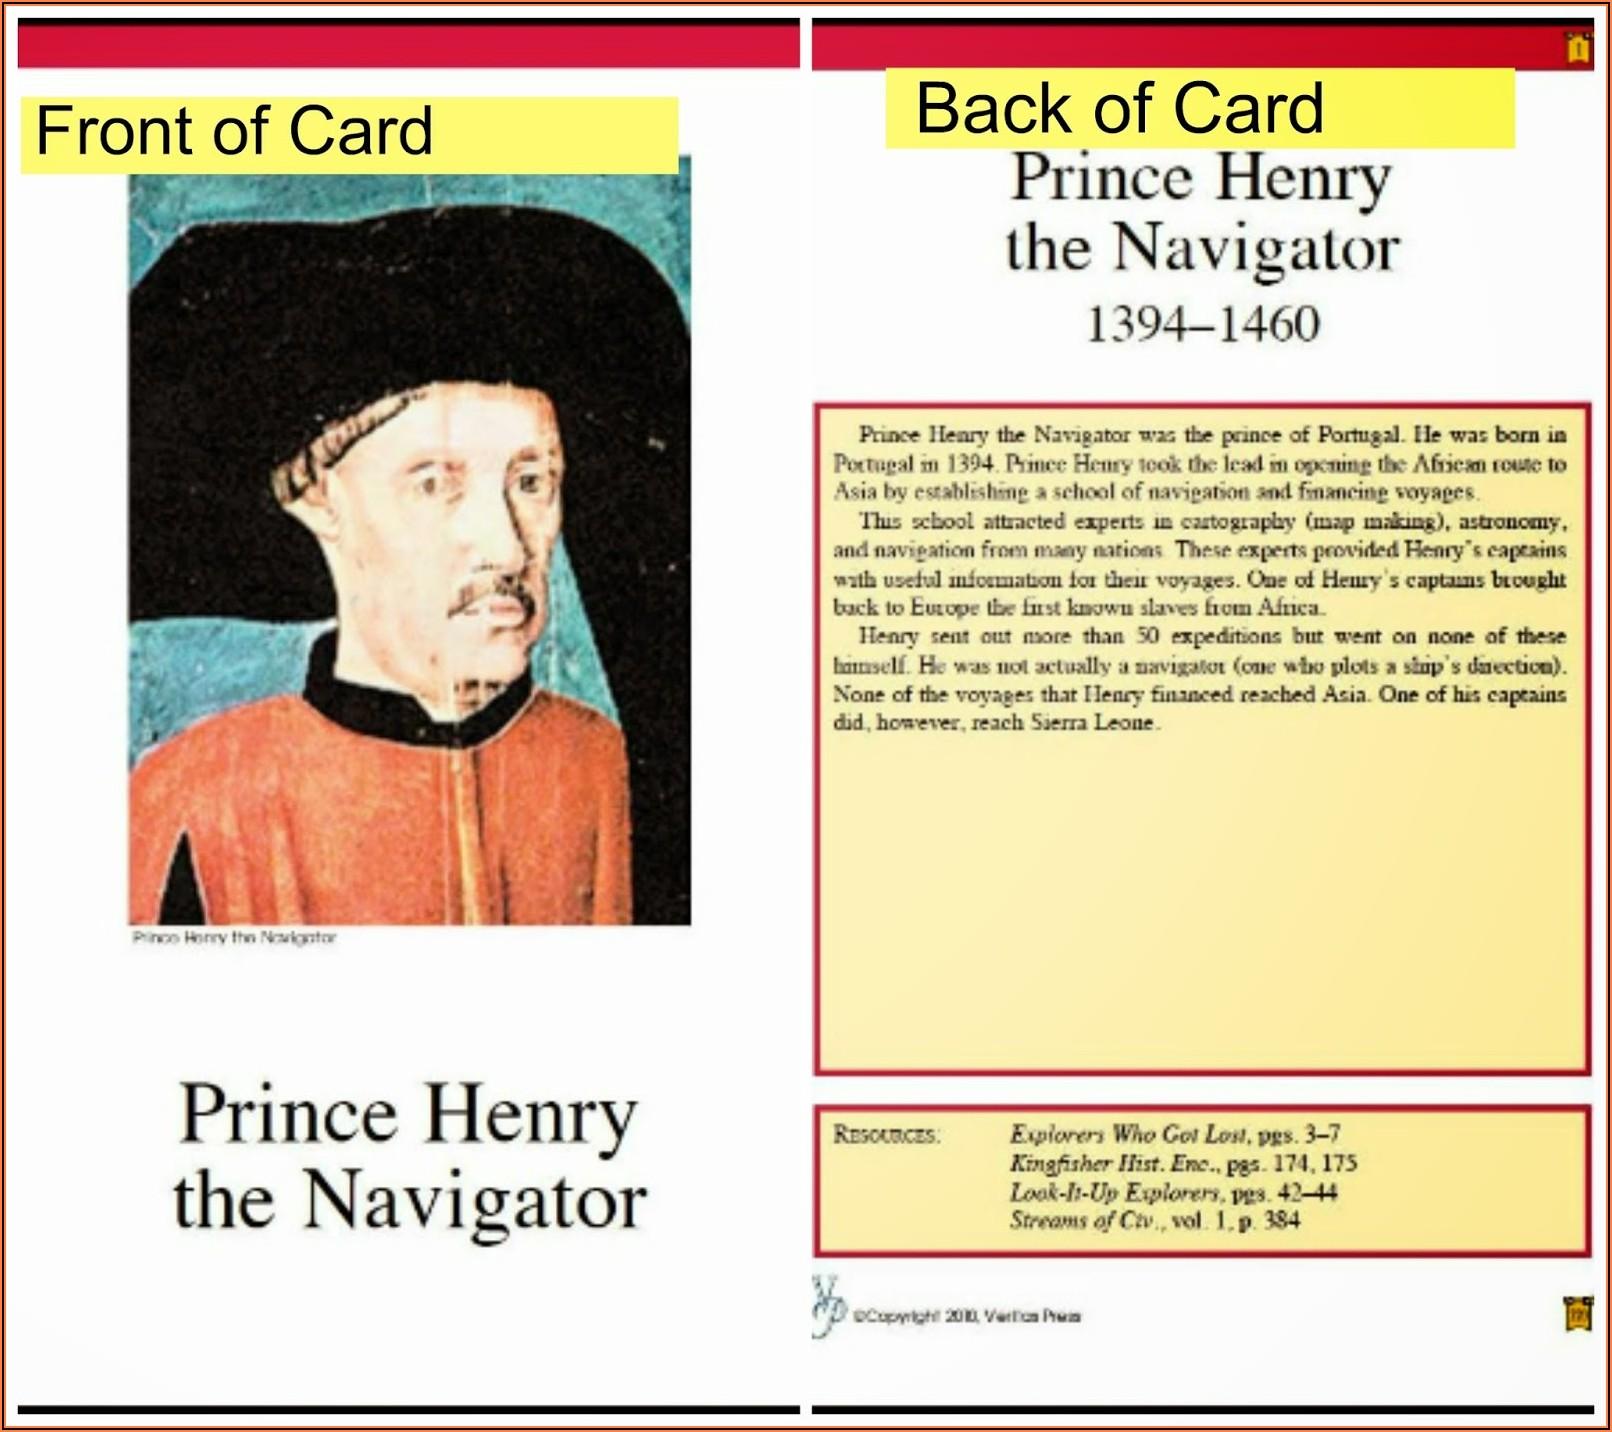 Veritas Press History Cards Review